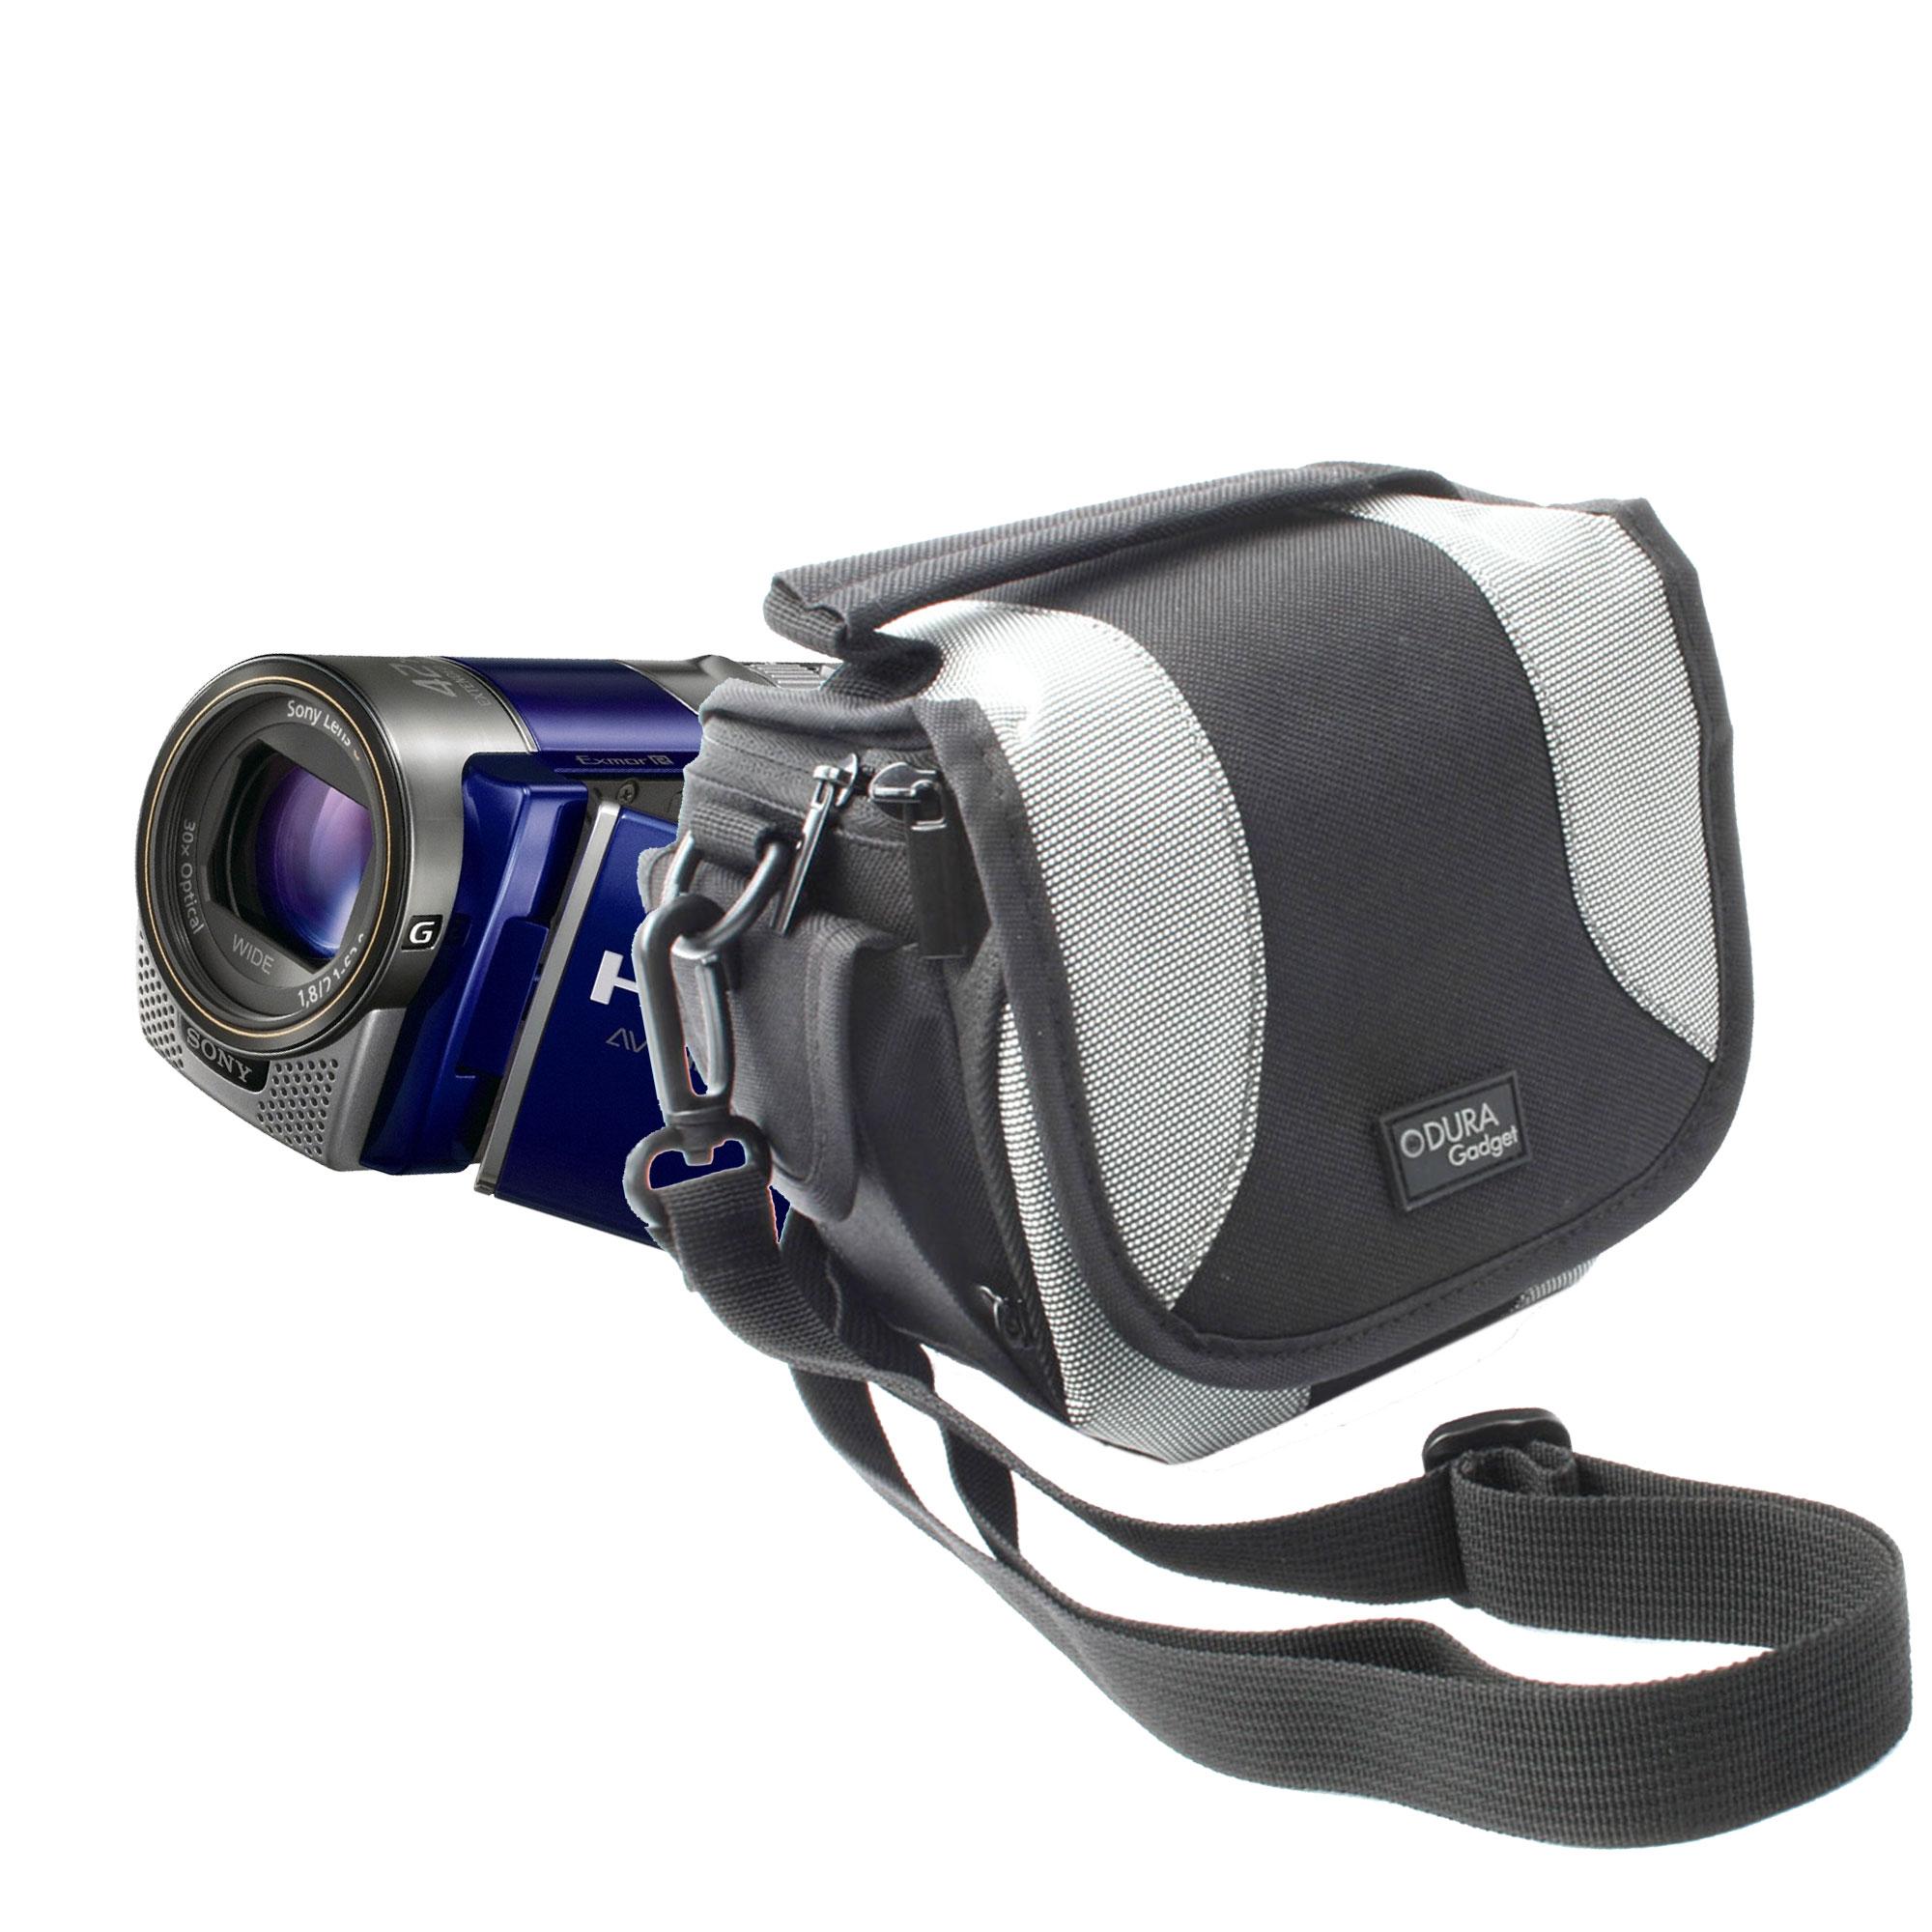 Housse de transport avec bandouli re pour cam scopes sony for Housse camescope sony